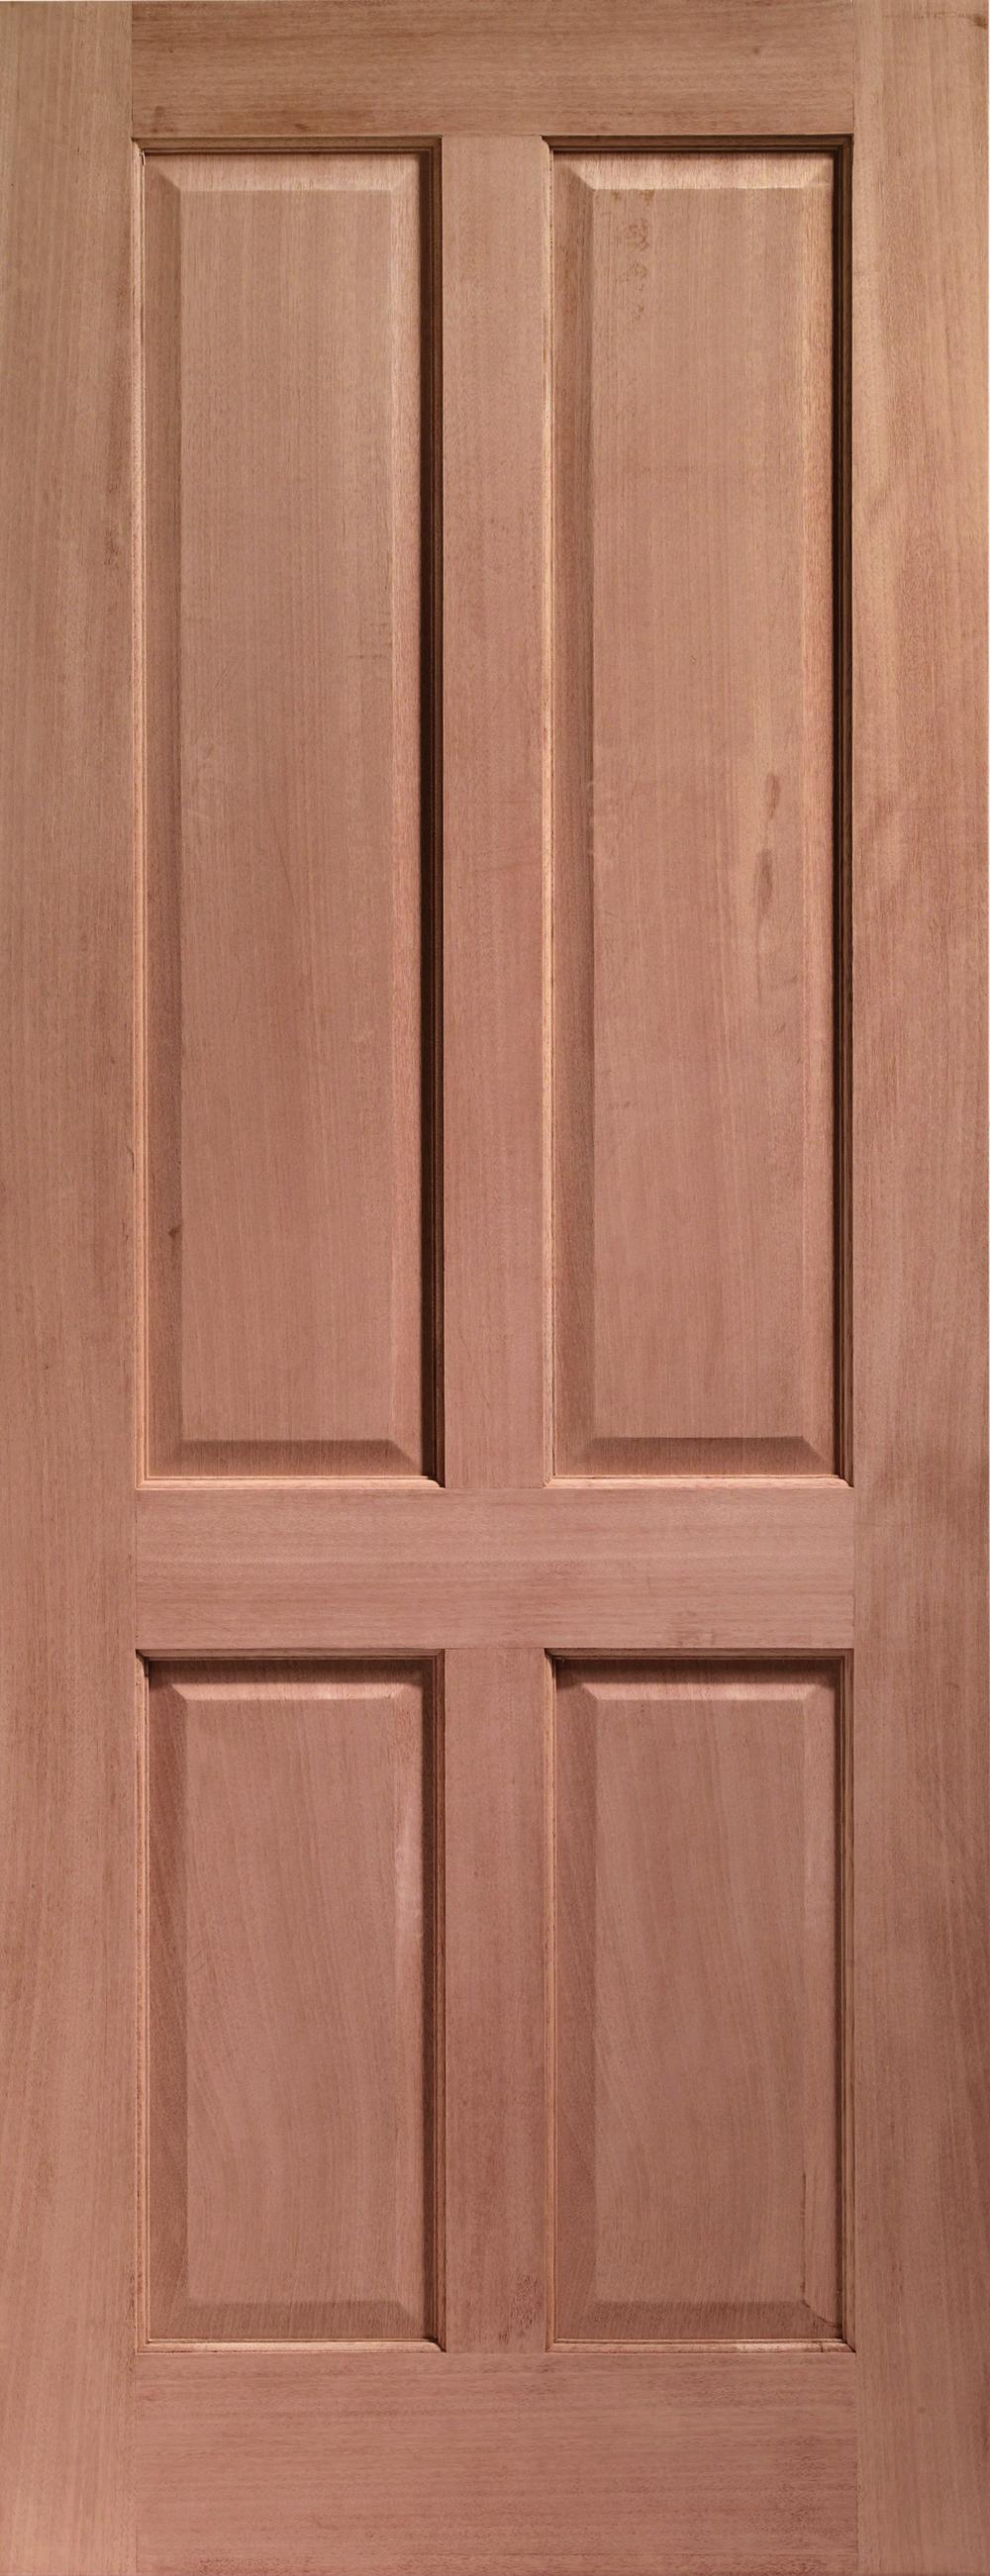 Hardwood Victorian.jpg